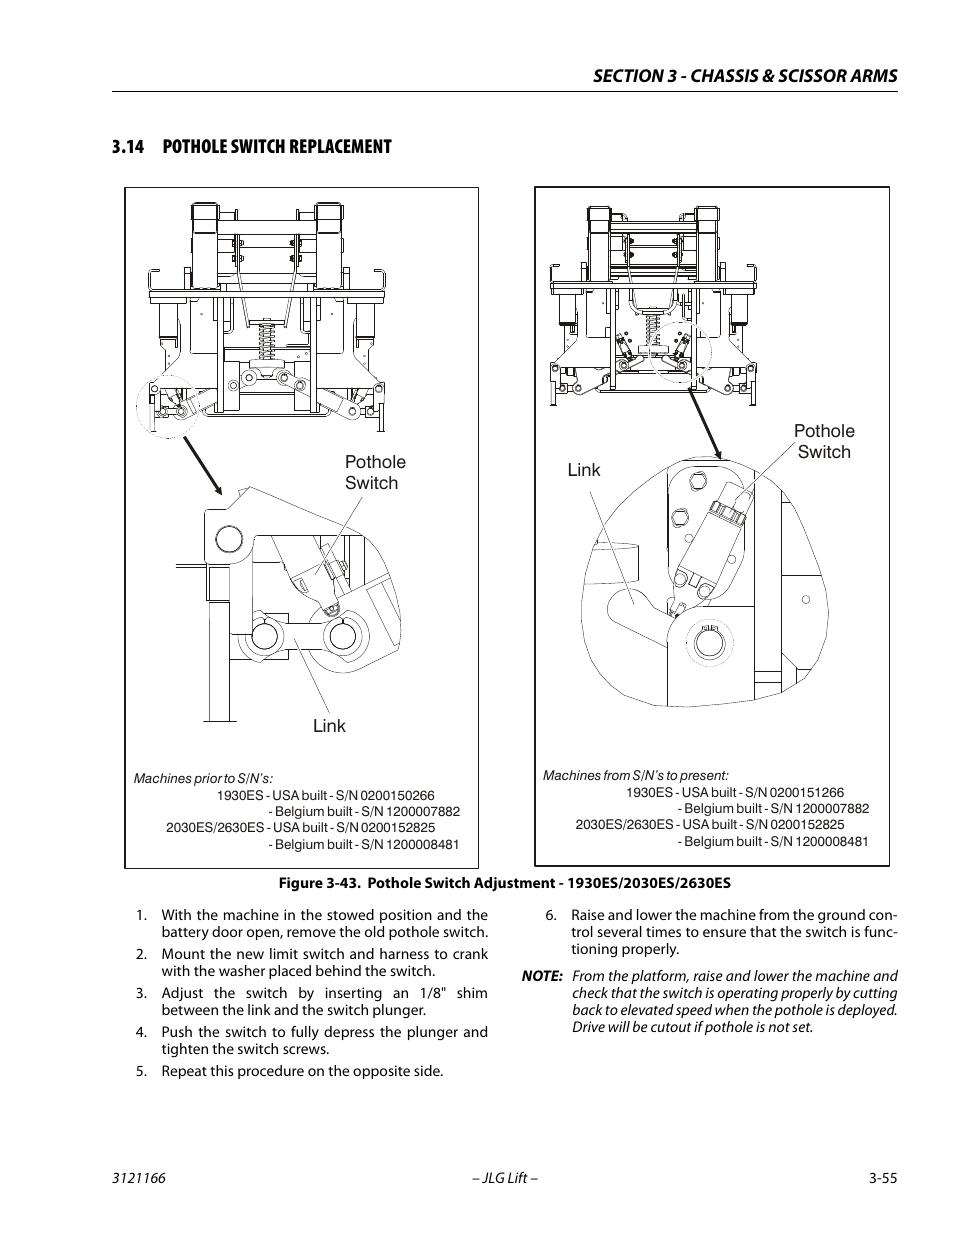 110 Switch Wiring Diagrams 14 Pothole Switch Replacement Pothole Switch Replacement